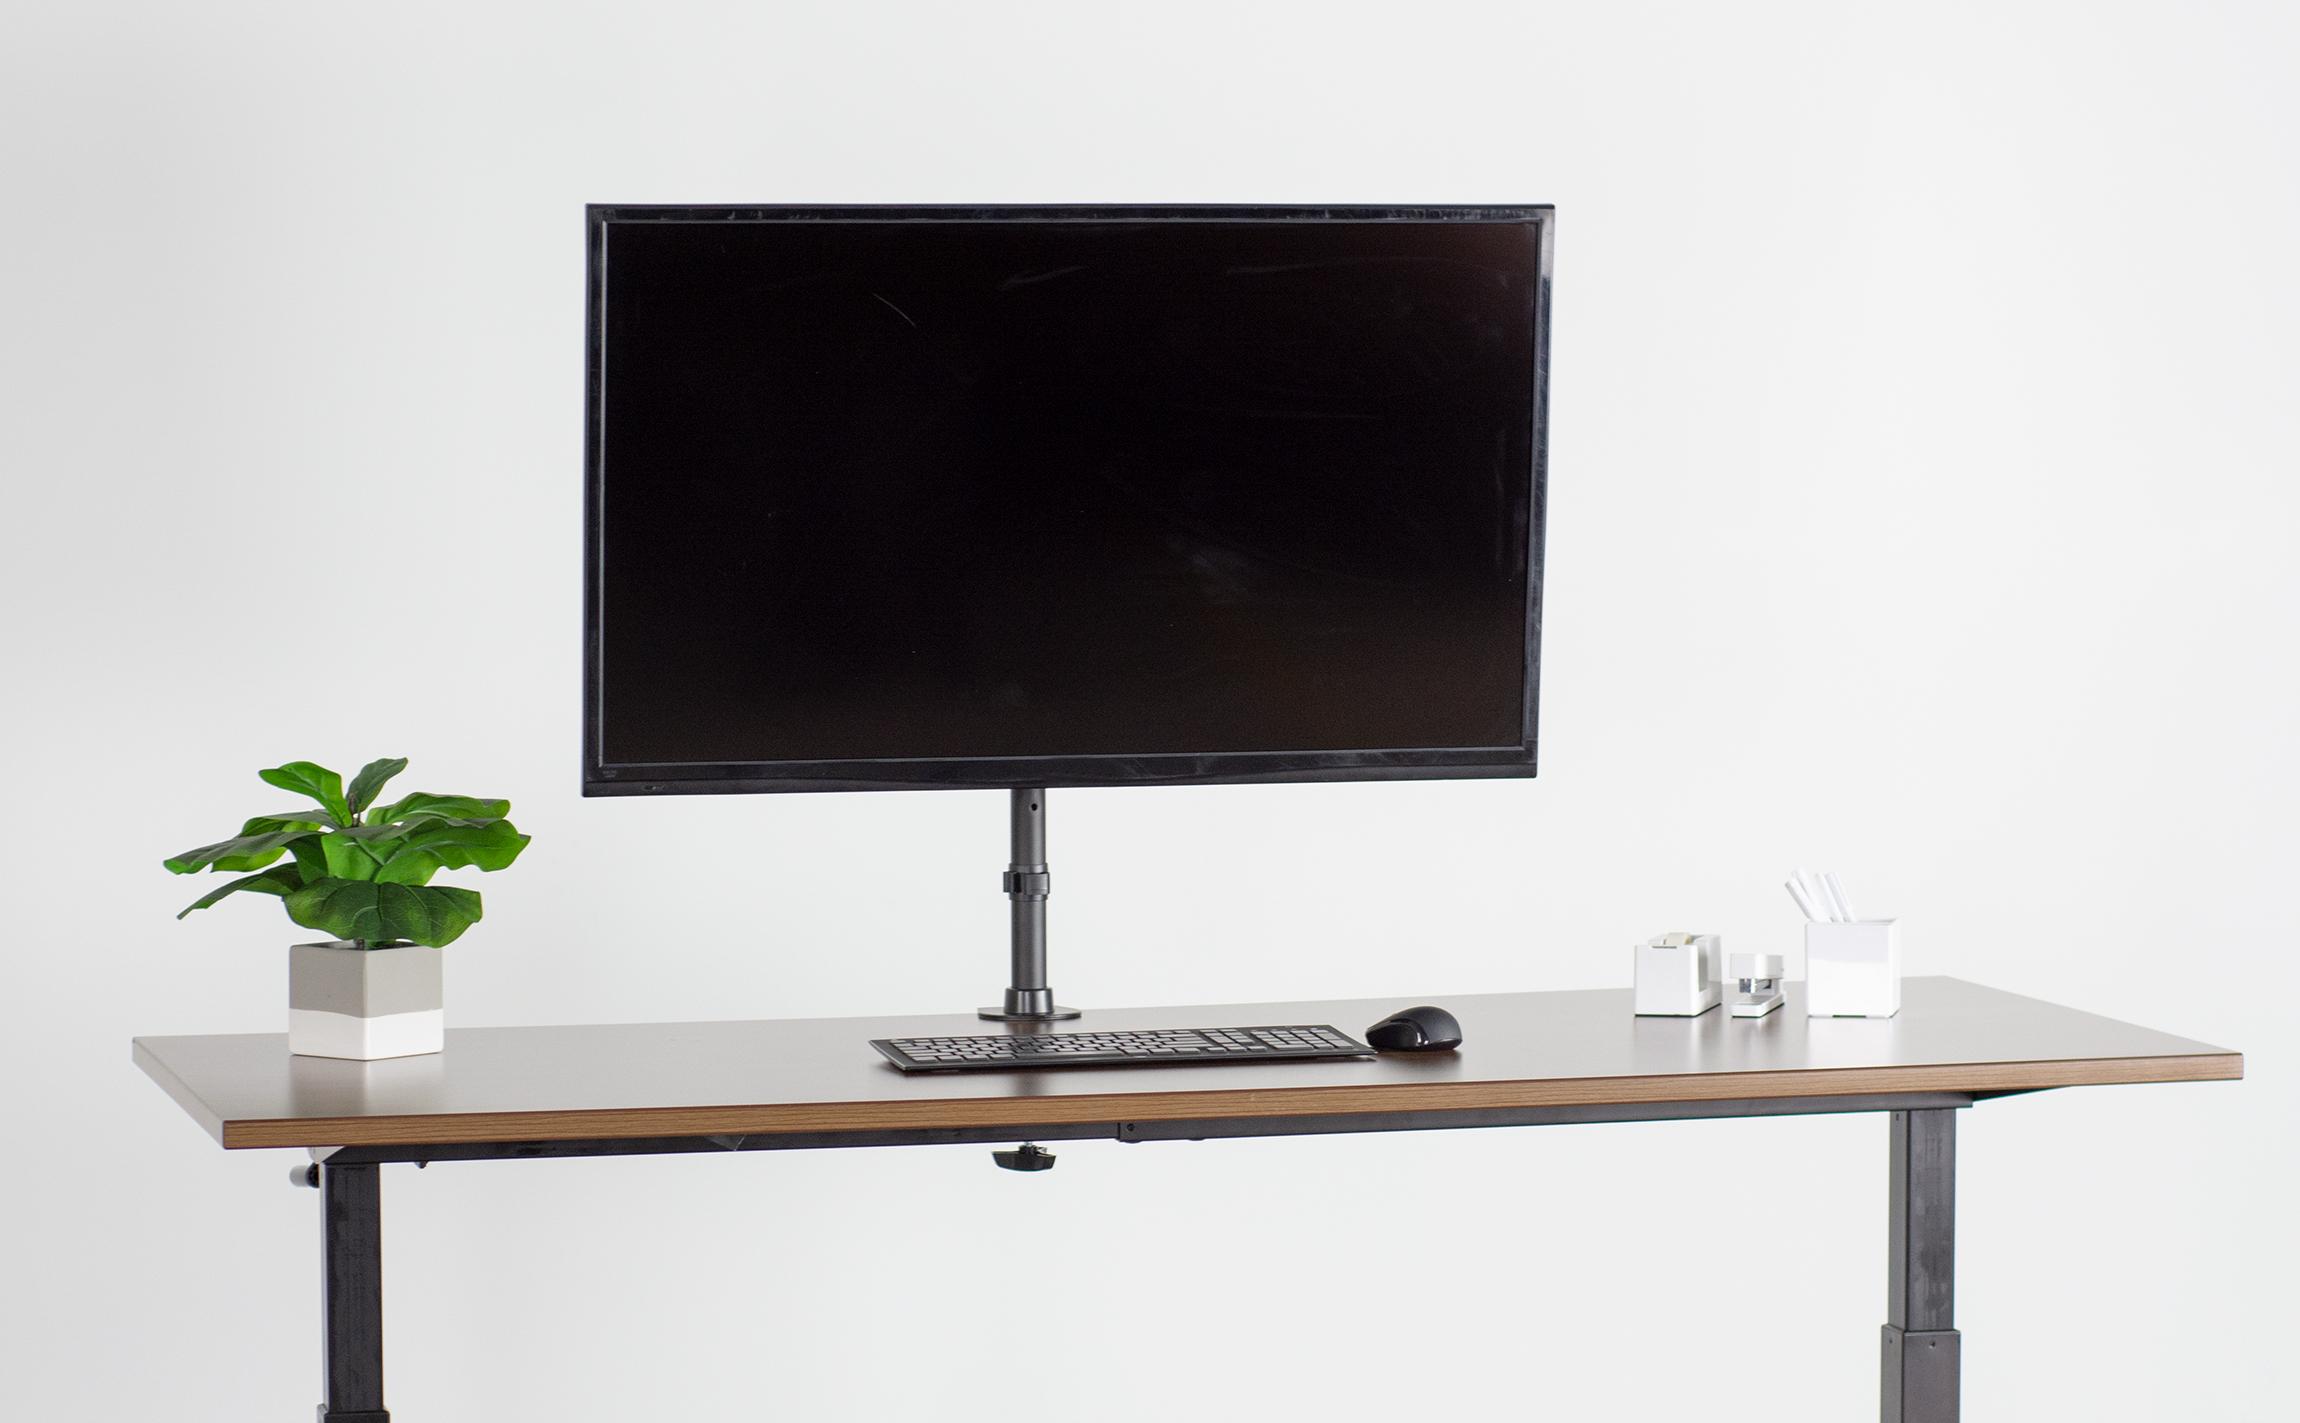 Tv Desk Stand 3 19 Ybonlineacess De